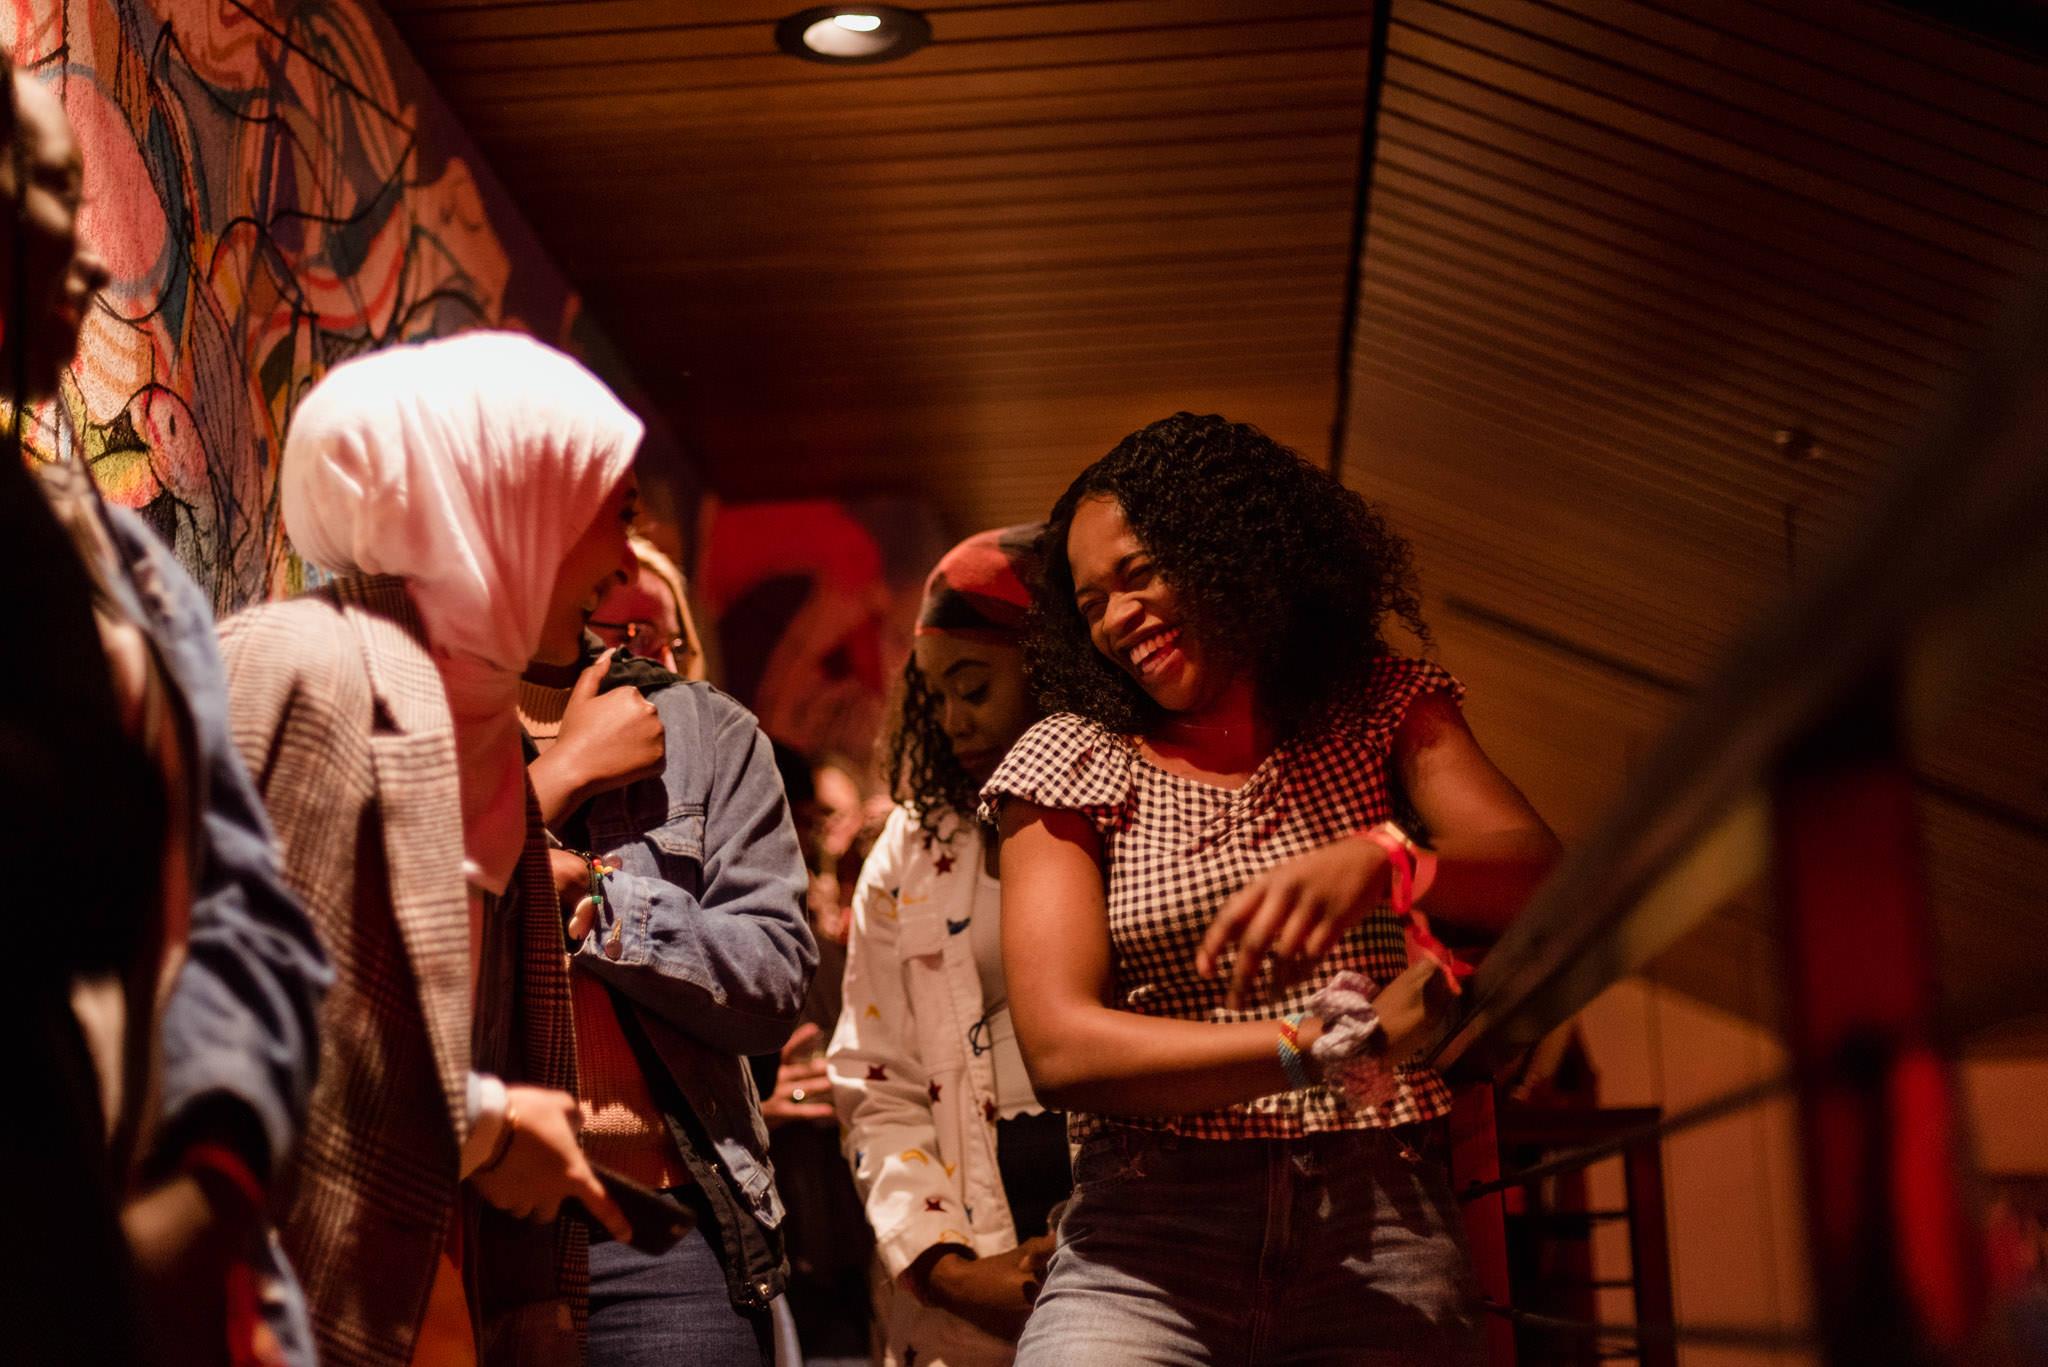 Zilla Photography - Treefort Music Festival Thursday Adventure-10.jpg